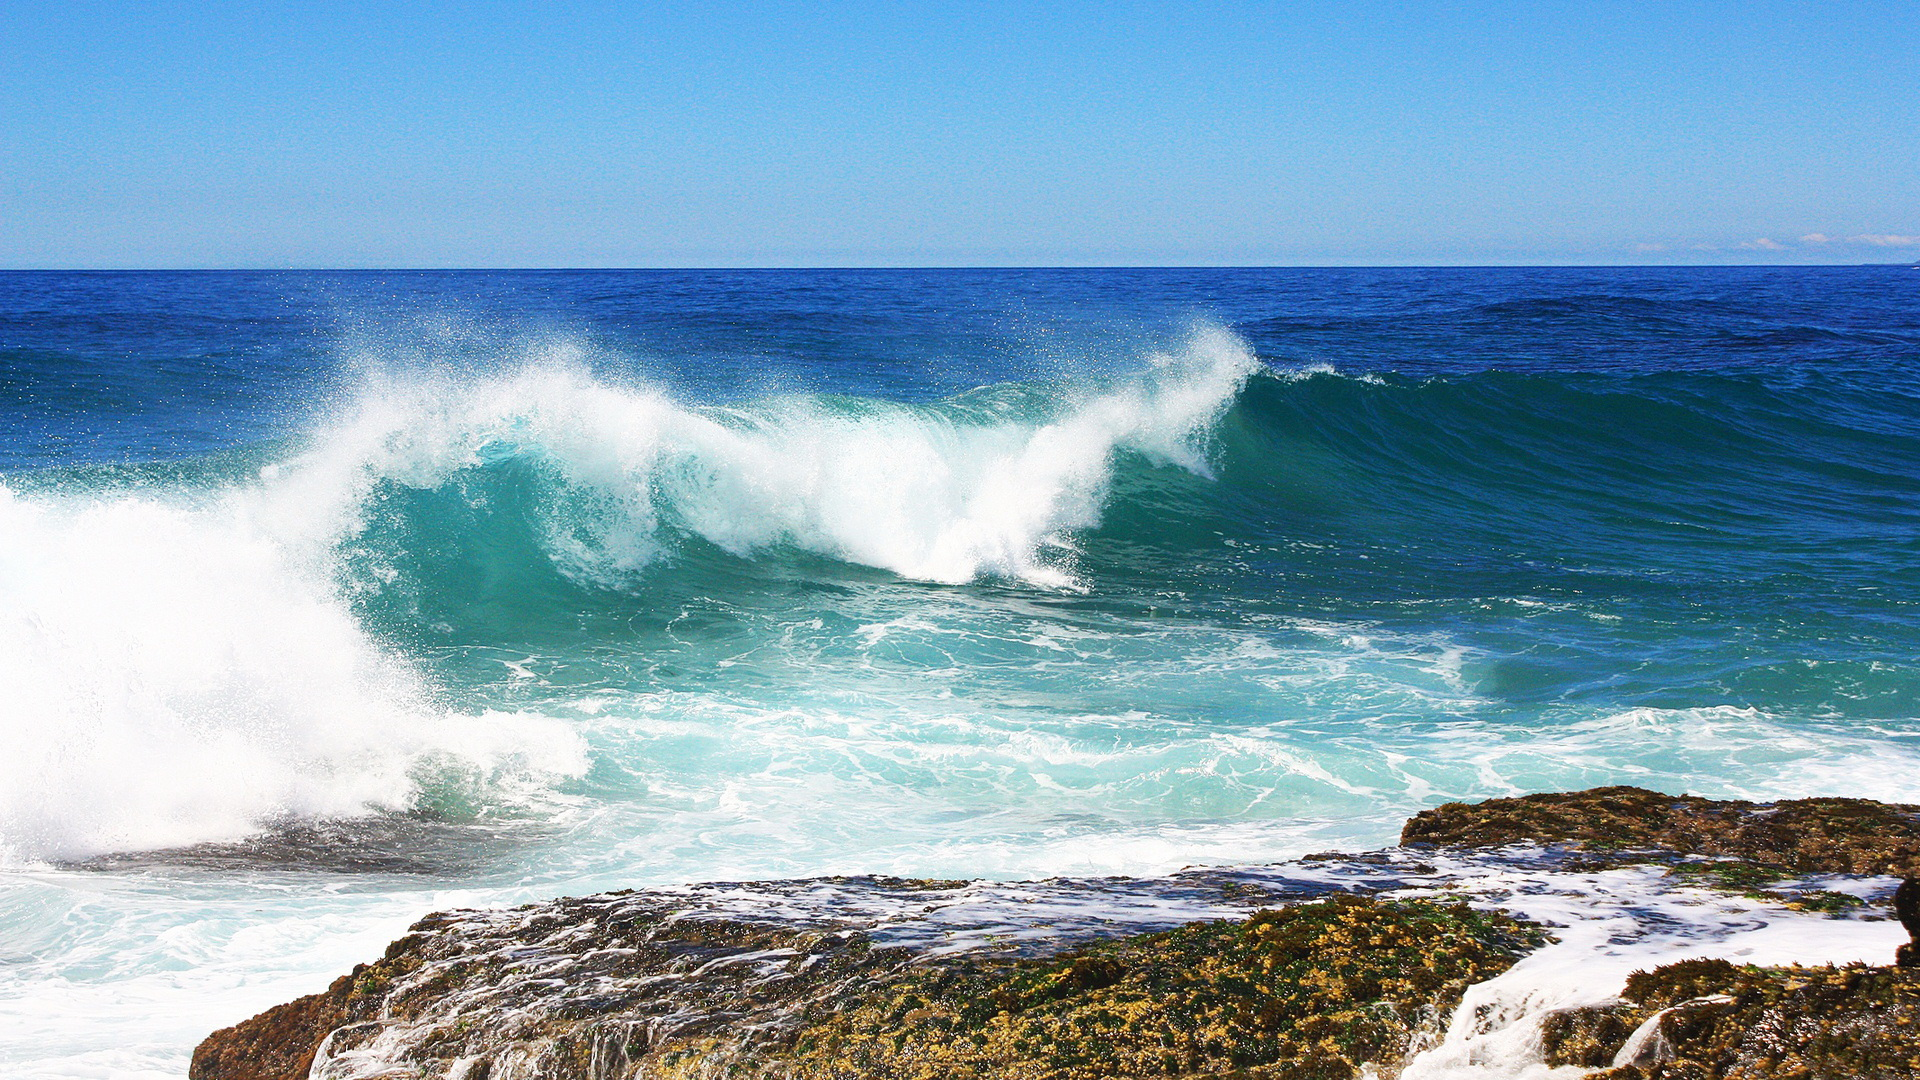 41+ Beach Waves Wallpapers for Desktop on WallpaperSafari